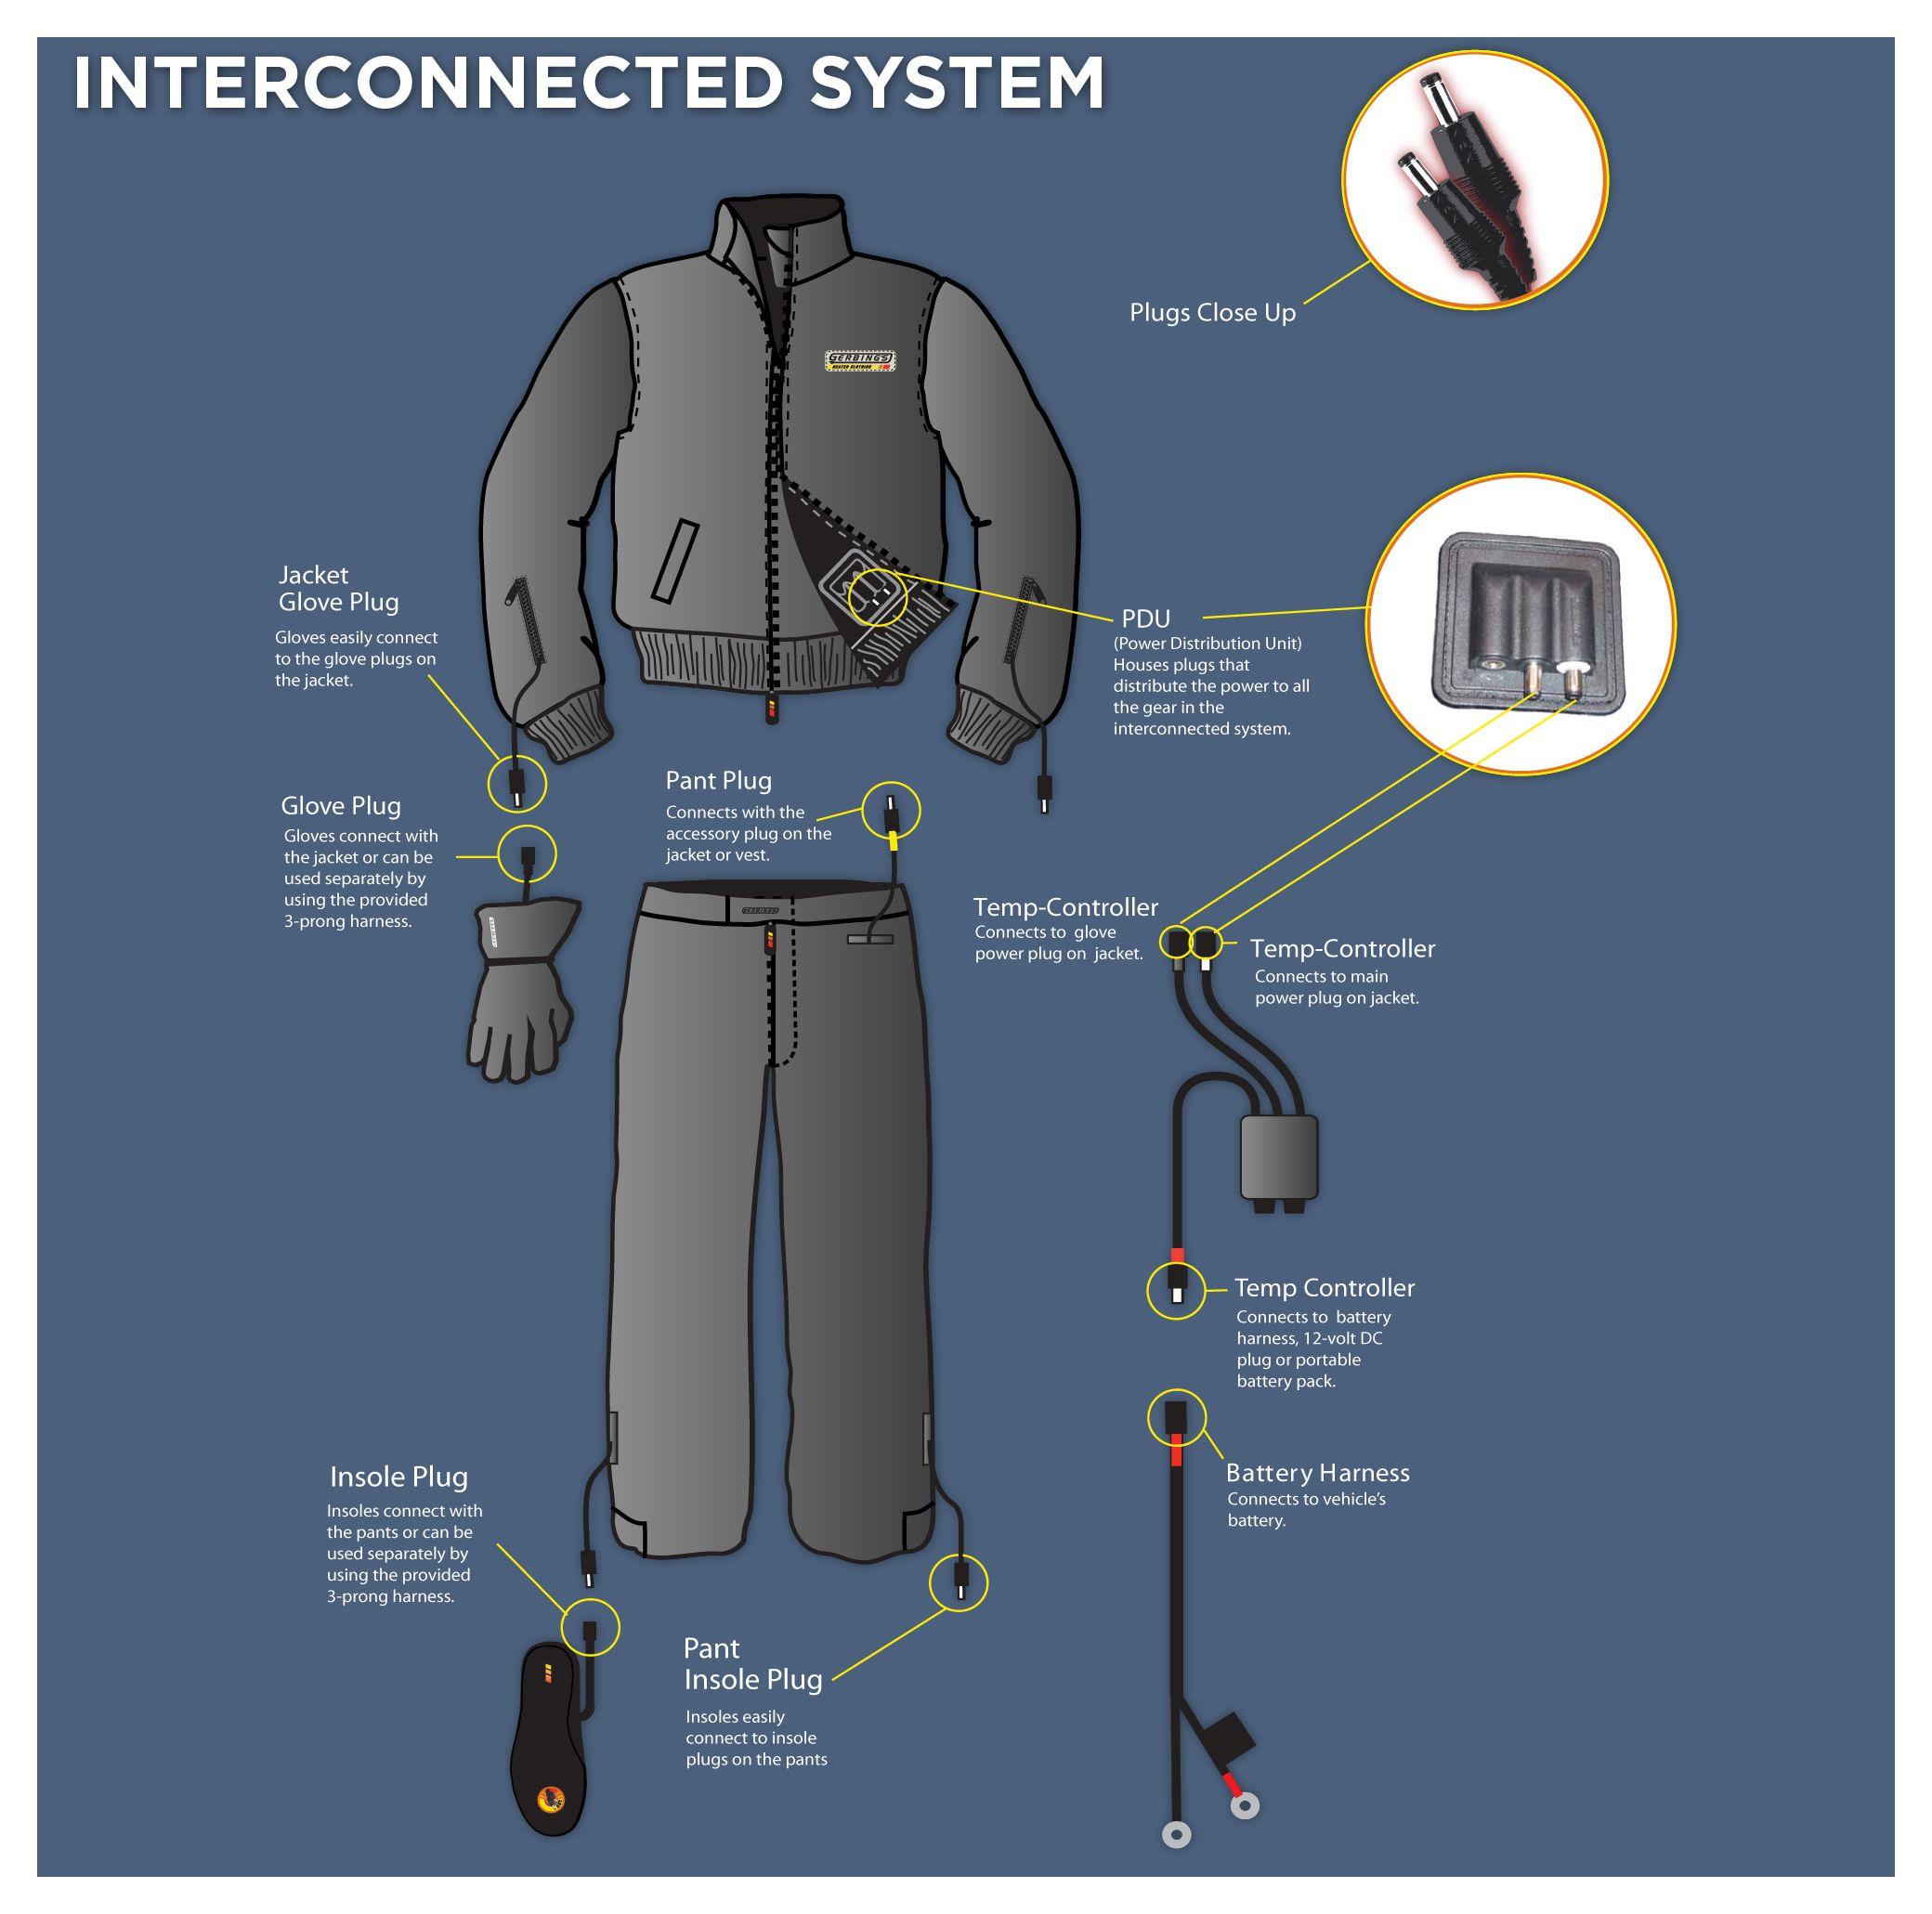 Gerbing Heated Clothing Wiring Diagram - Circuit Diagram Symbols •